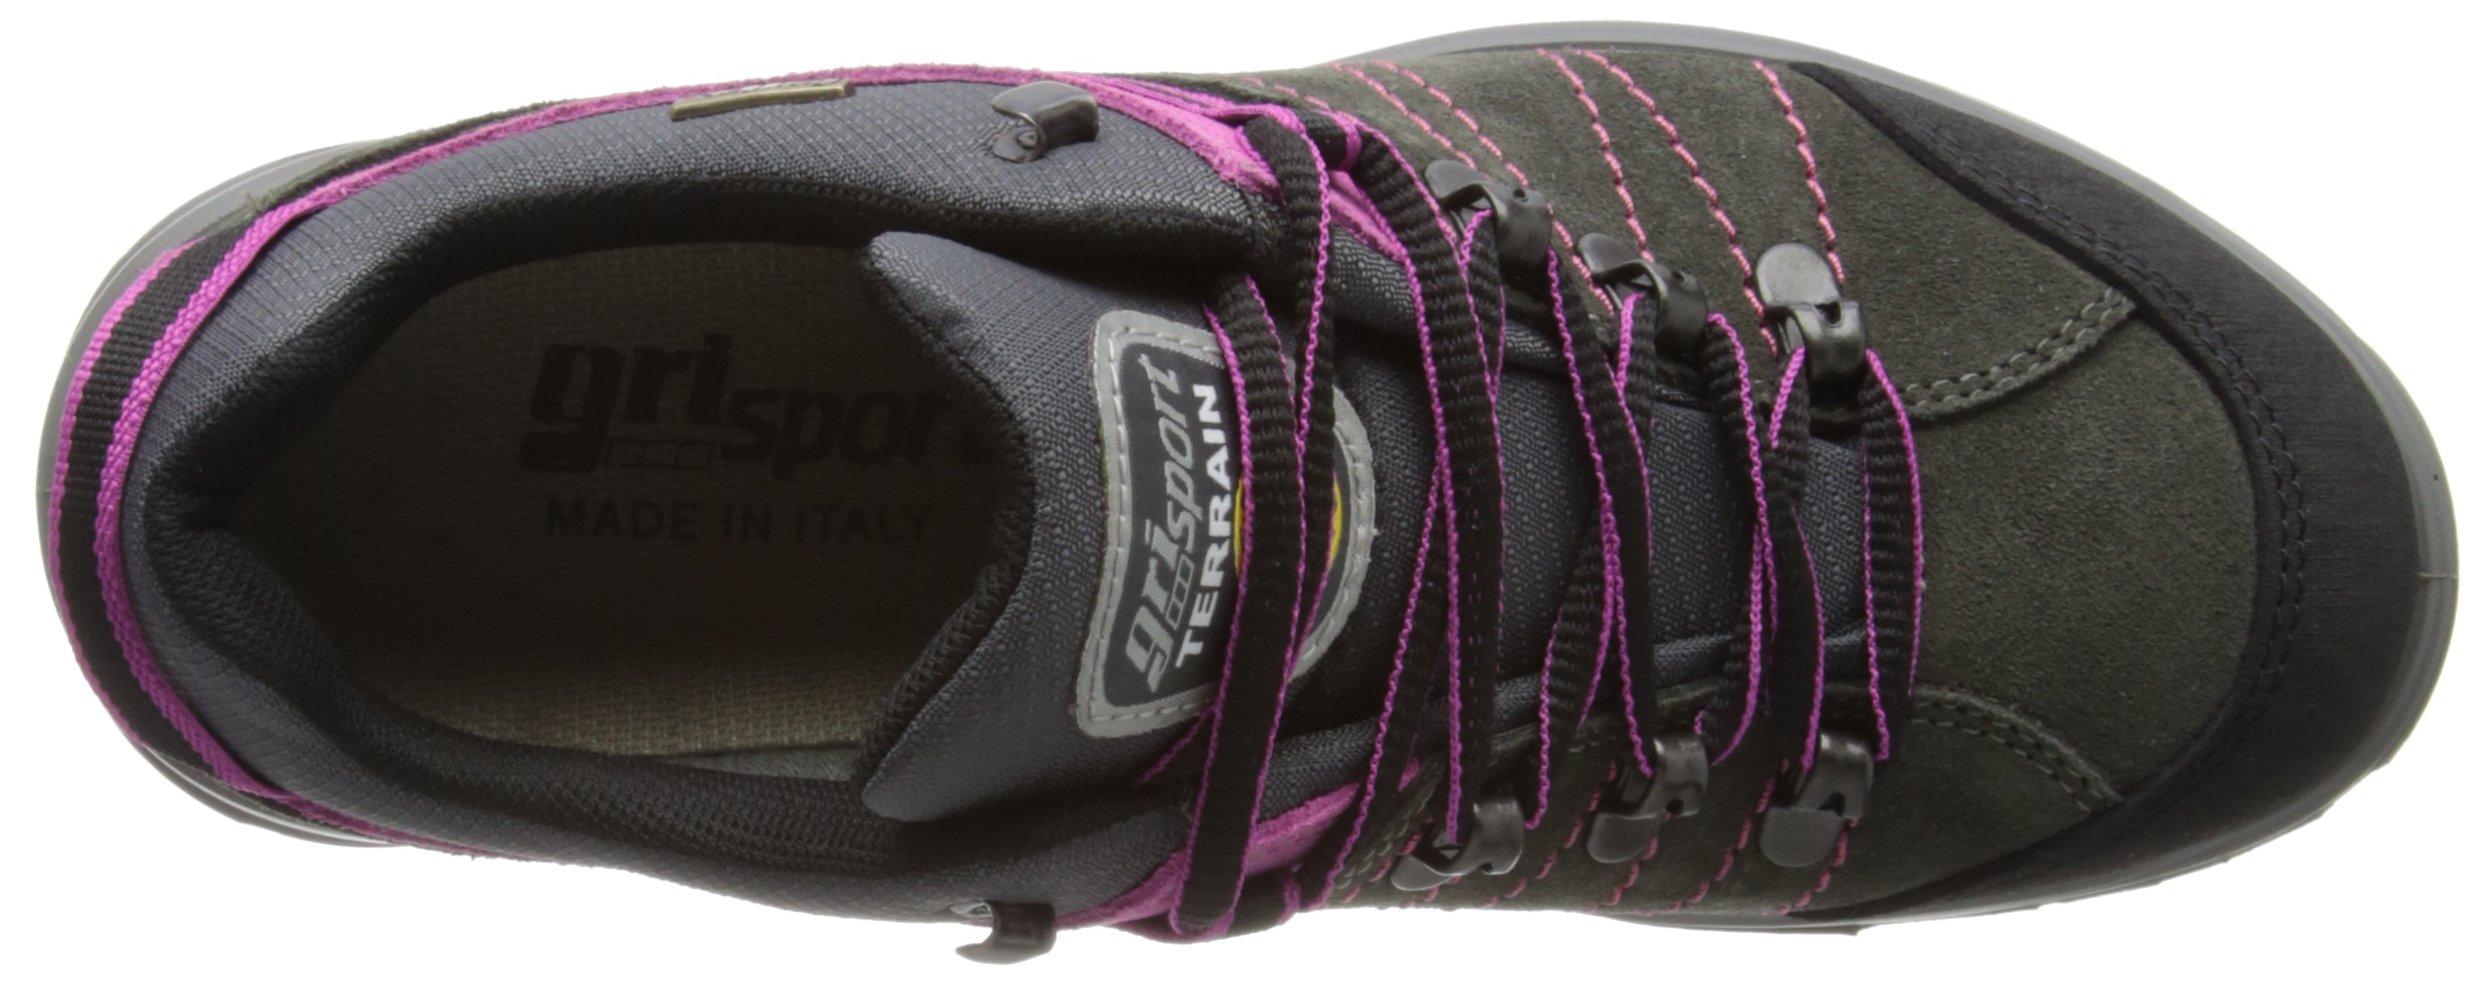 816Xupkz3sL - Grisport Womens Magma-Lo Hiking Shoes